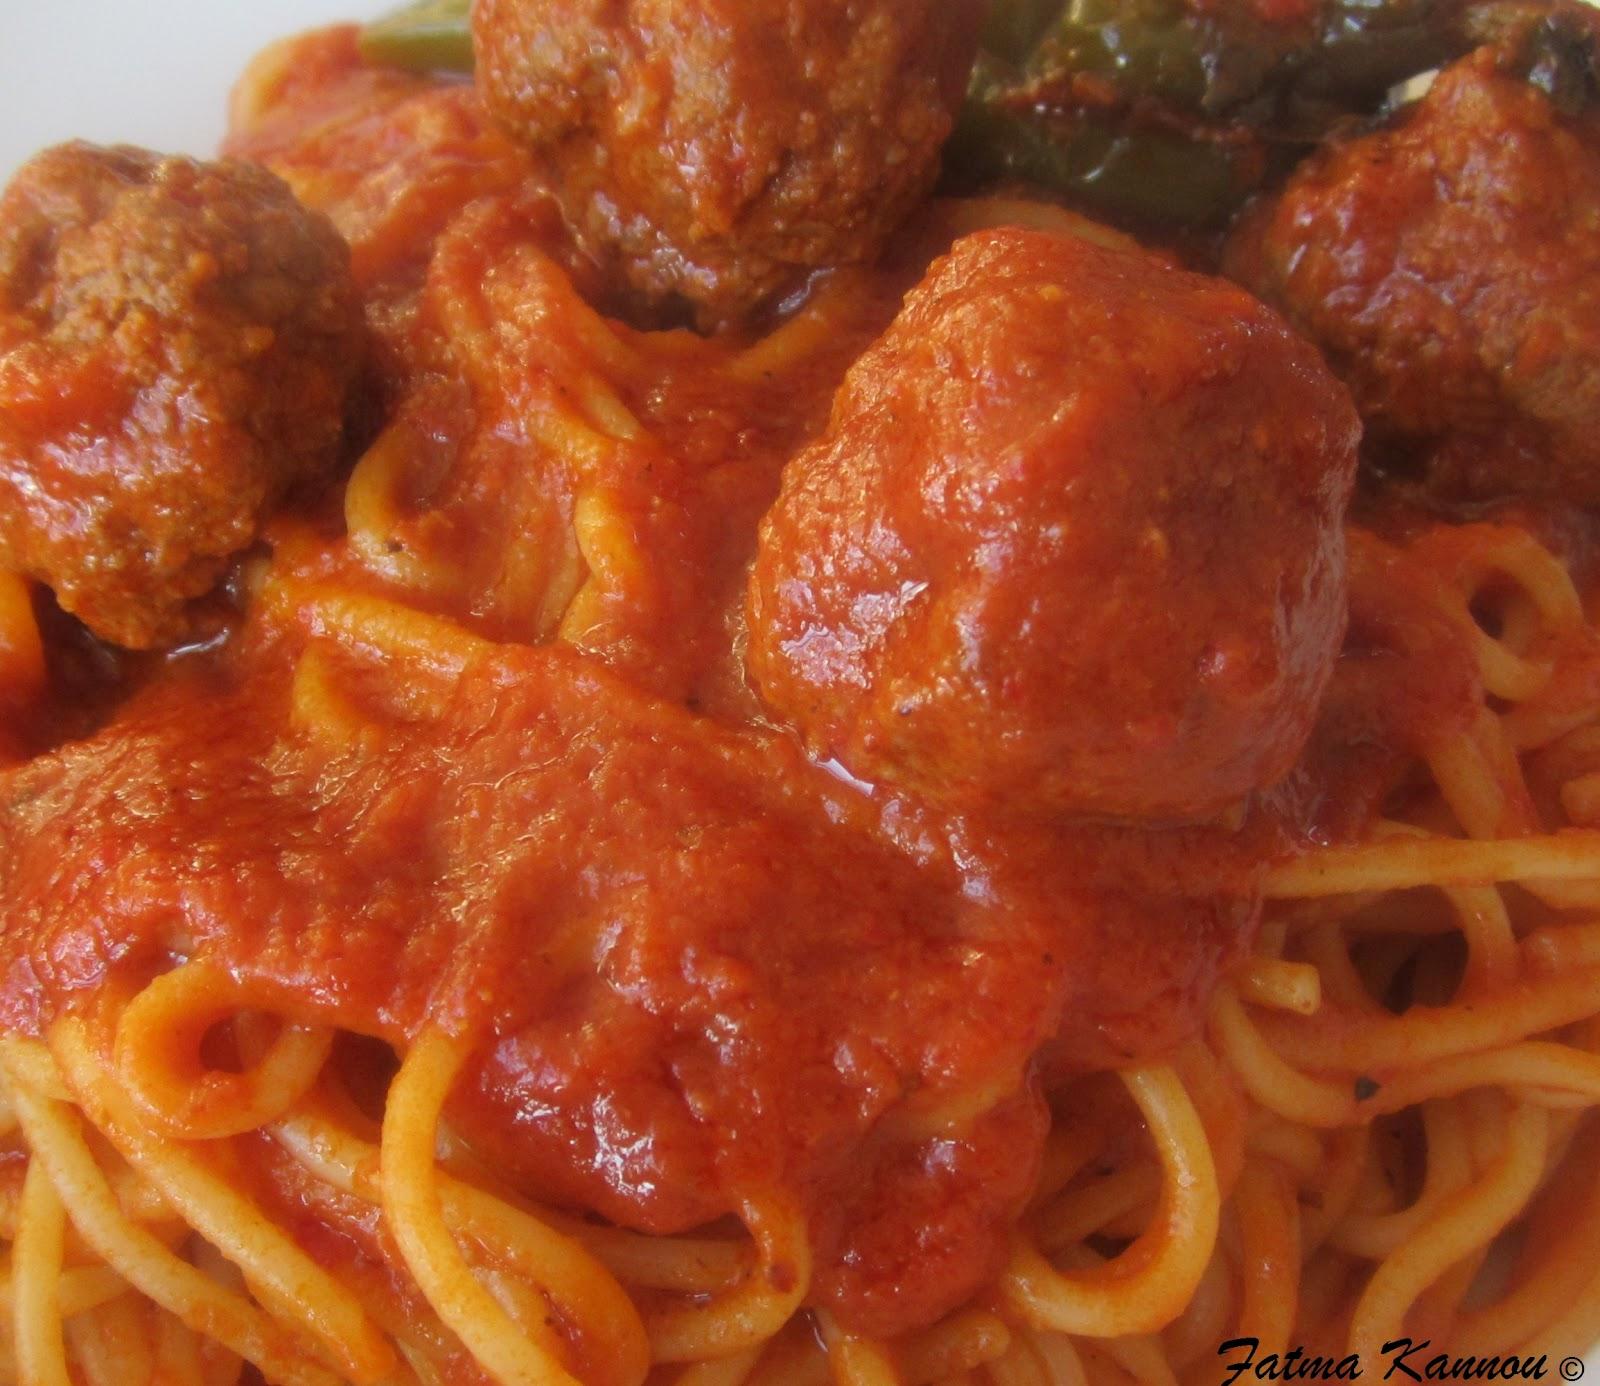 les doigts de fatma spaghetti boulette sauce tomate piquante makarouna bel salsa